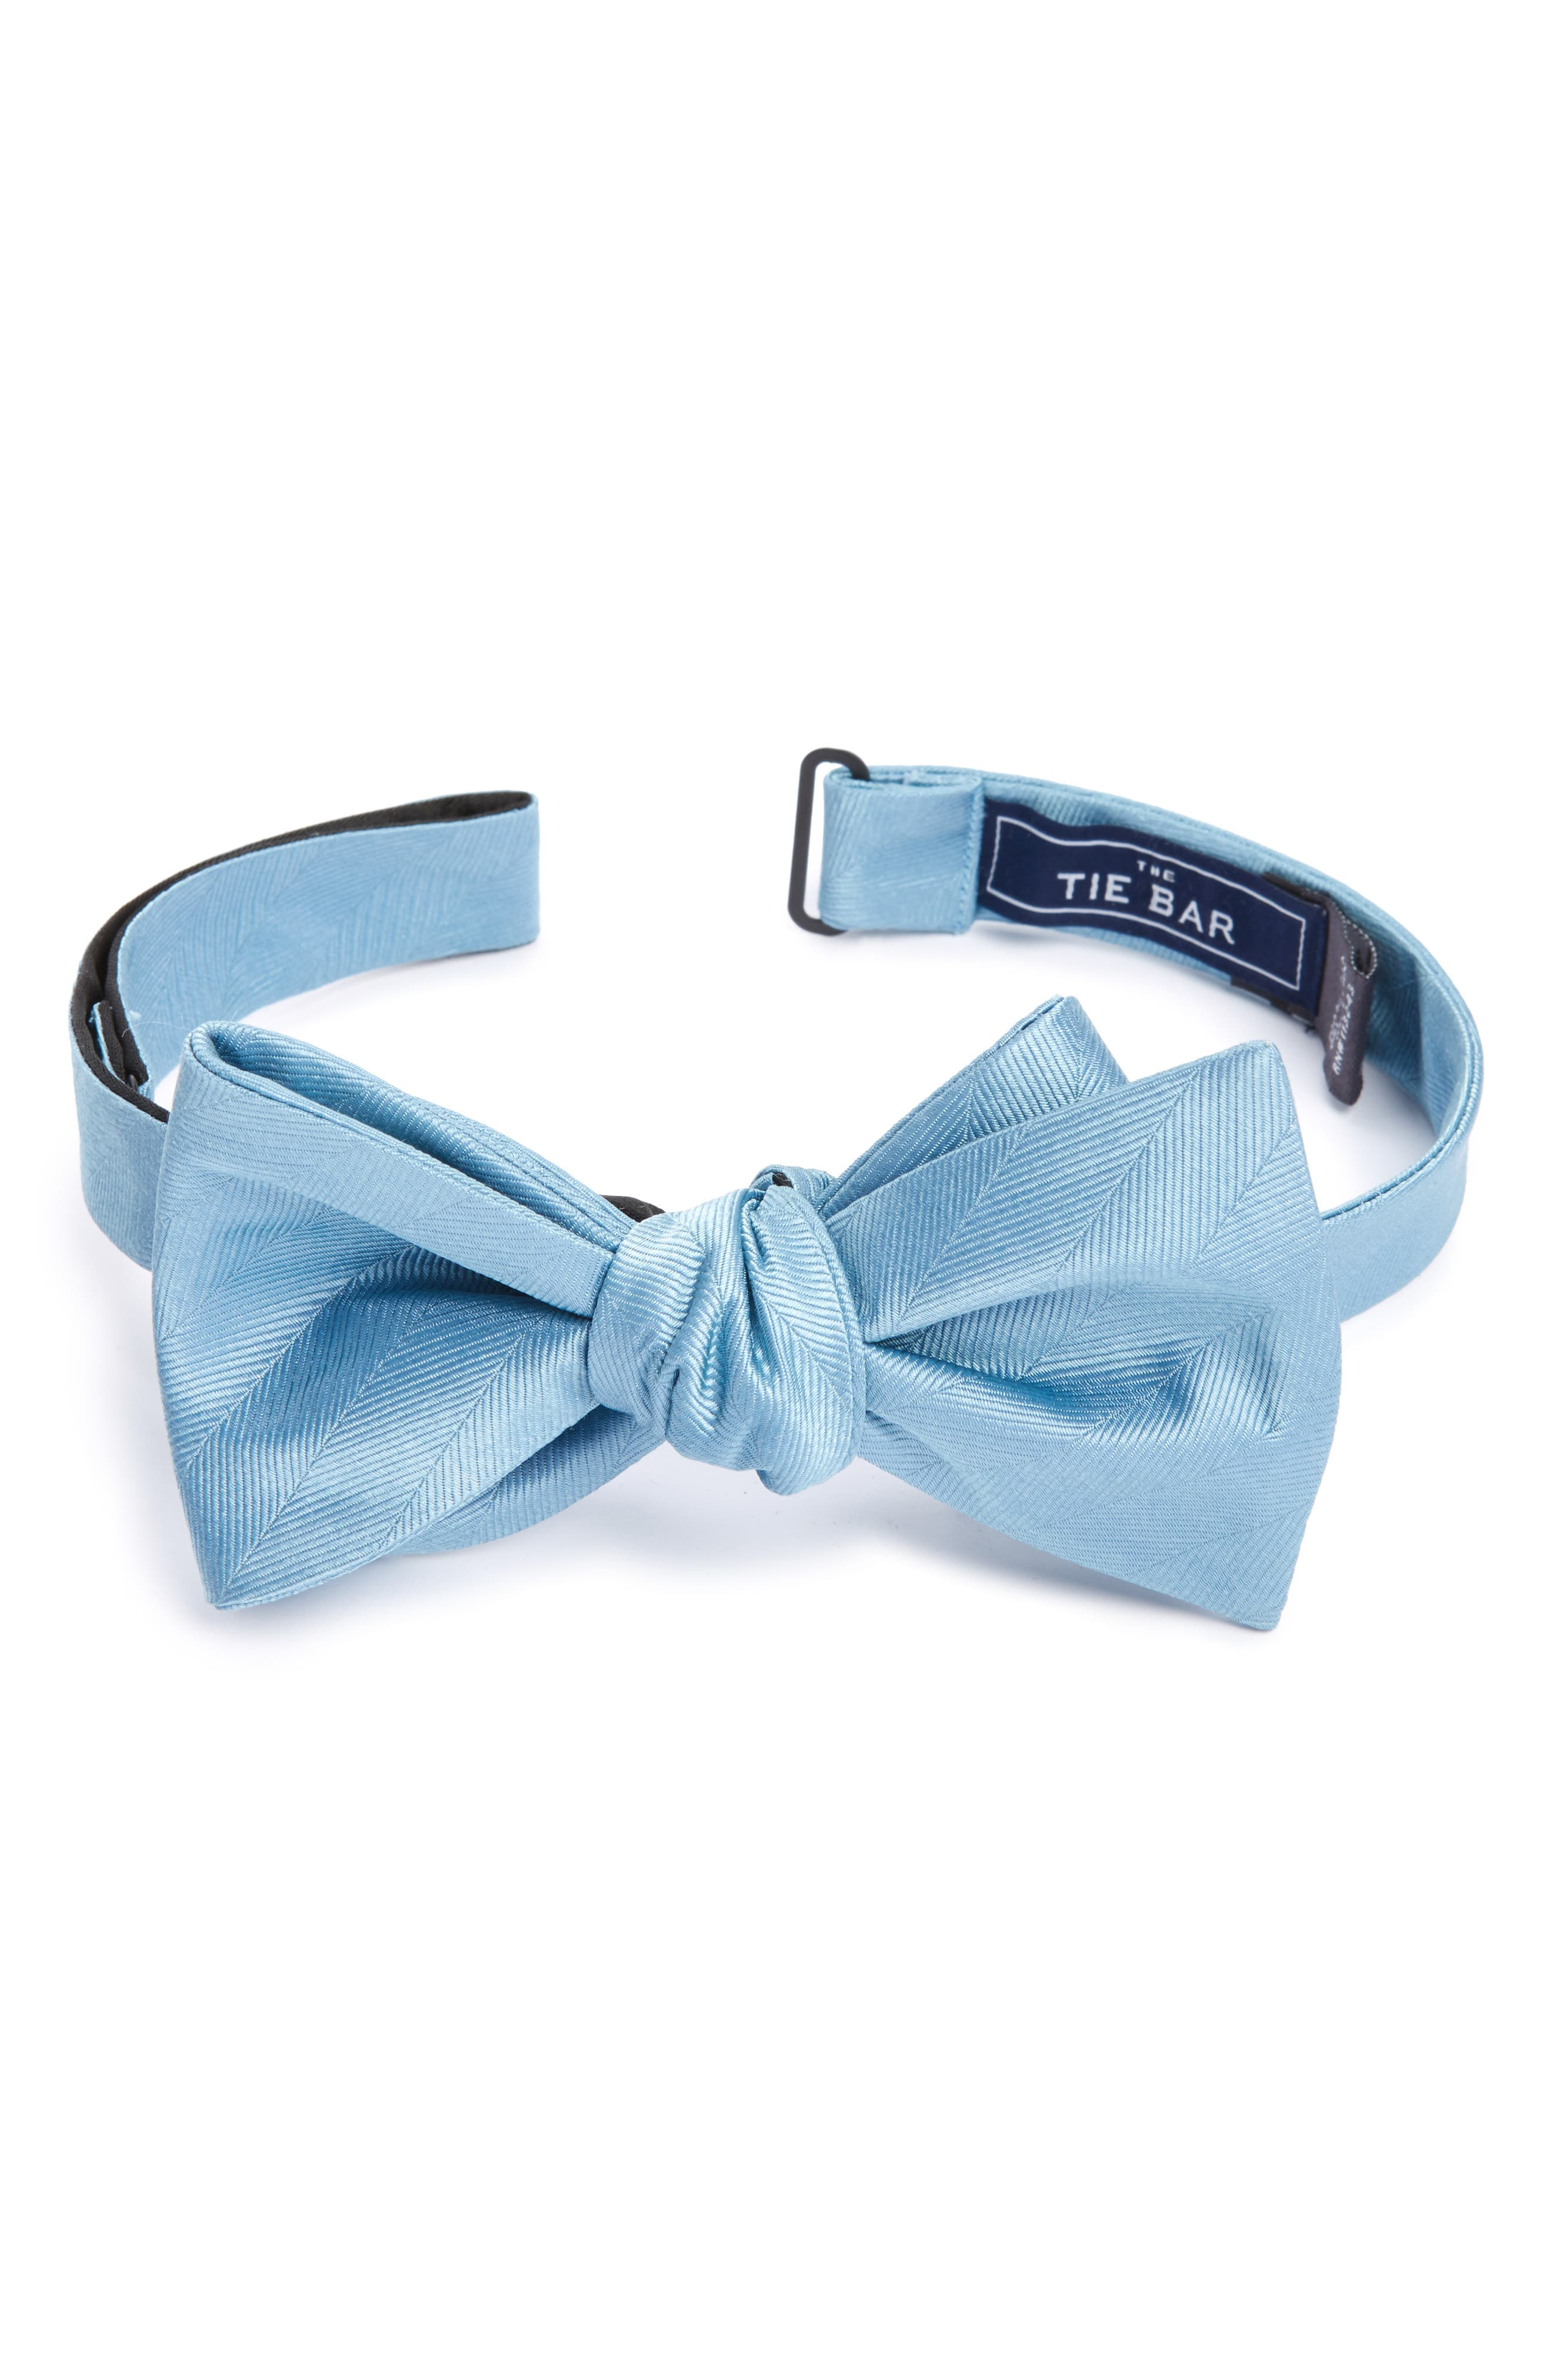 The Tie Bar Herringbone Silk Bow Tie